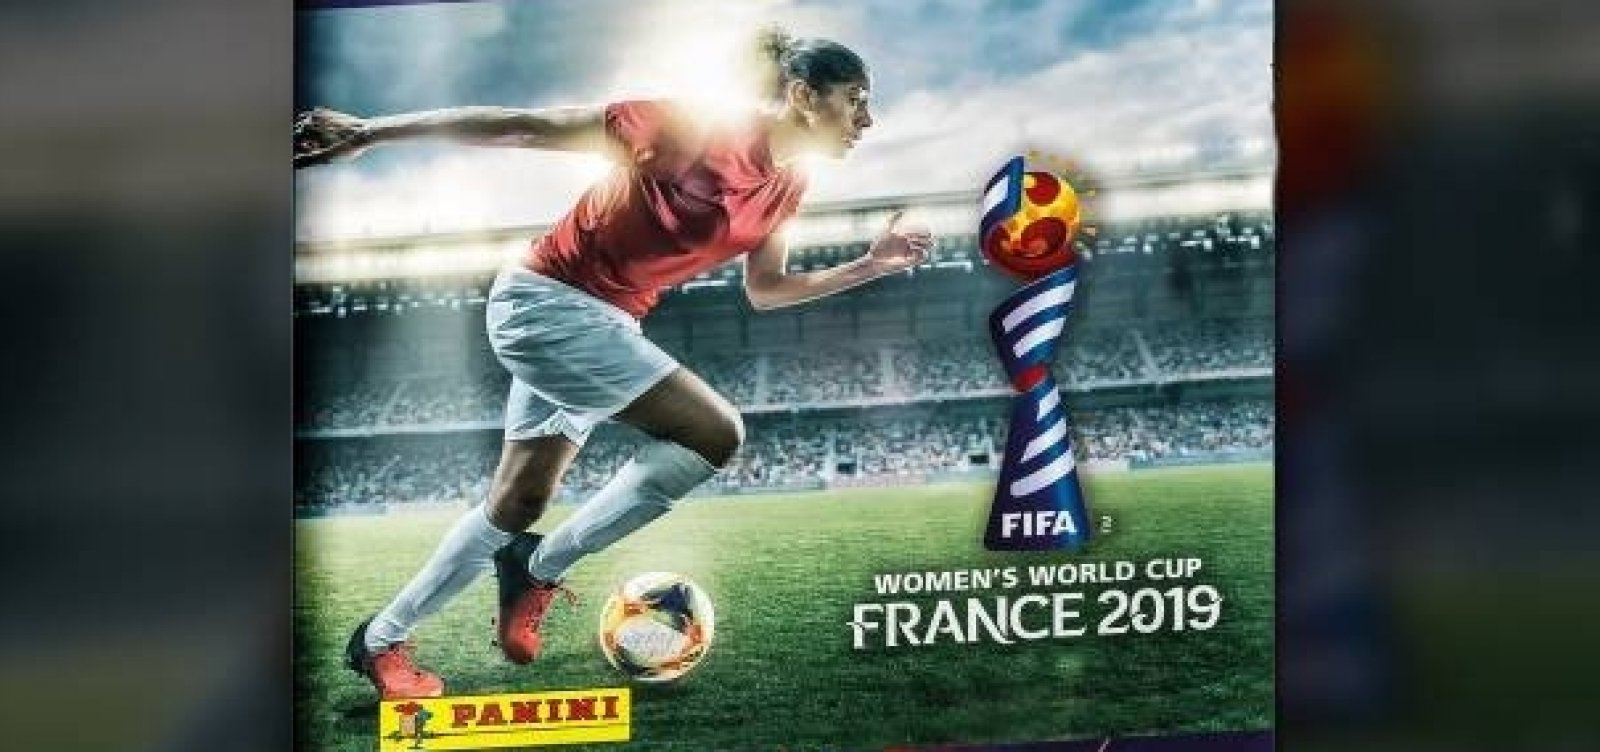 Copa do Mundo feminina terá álbum da Panini